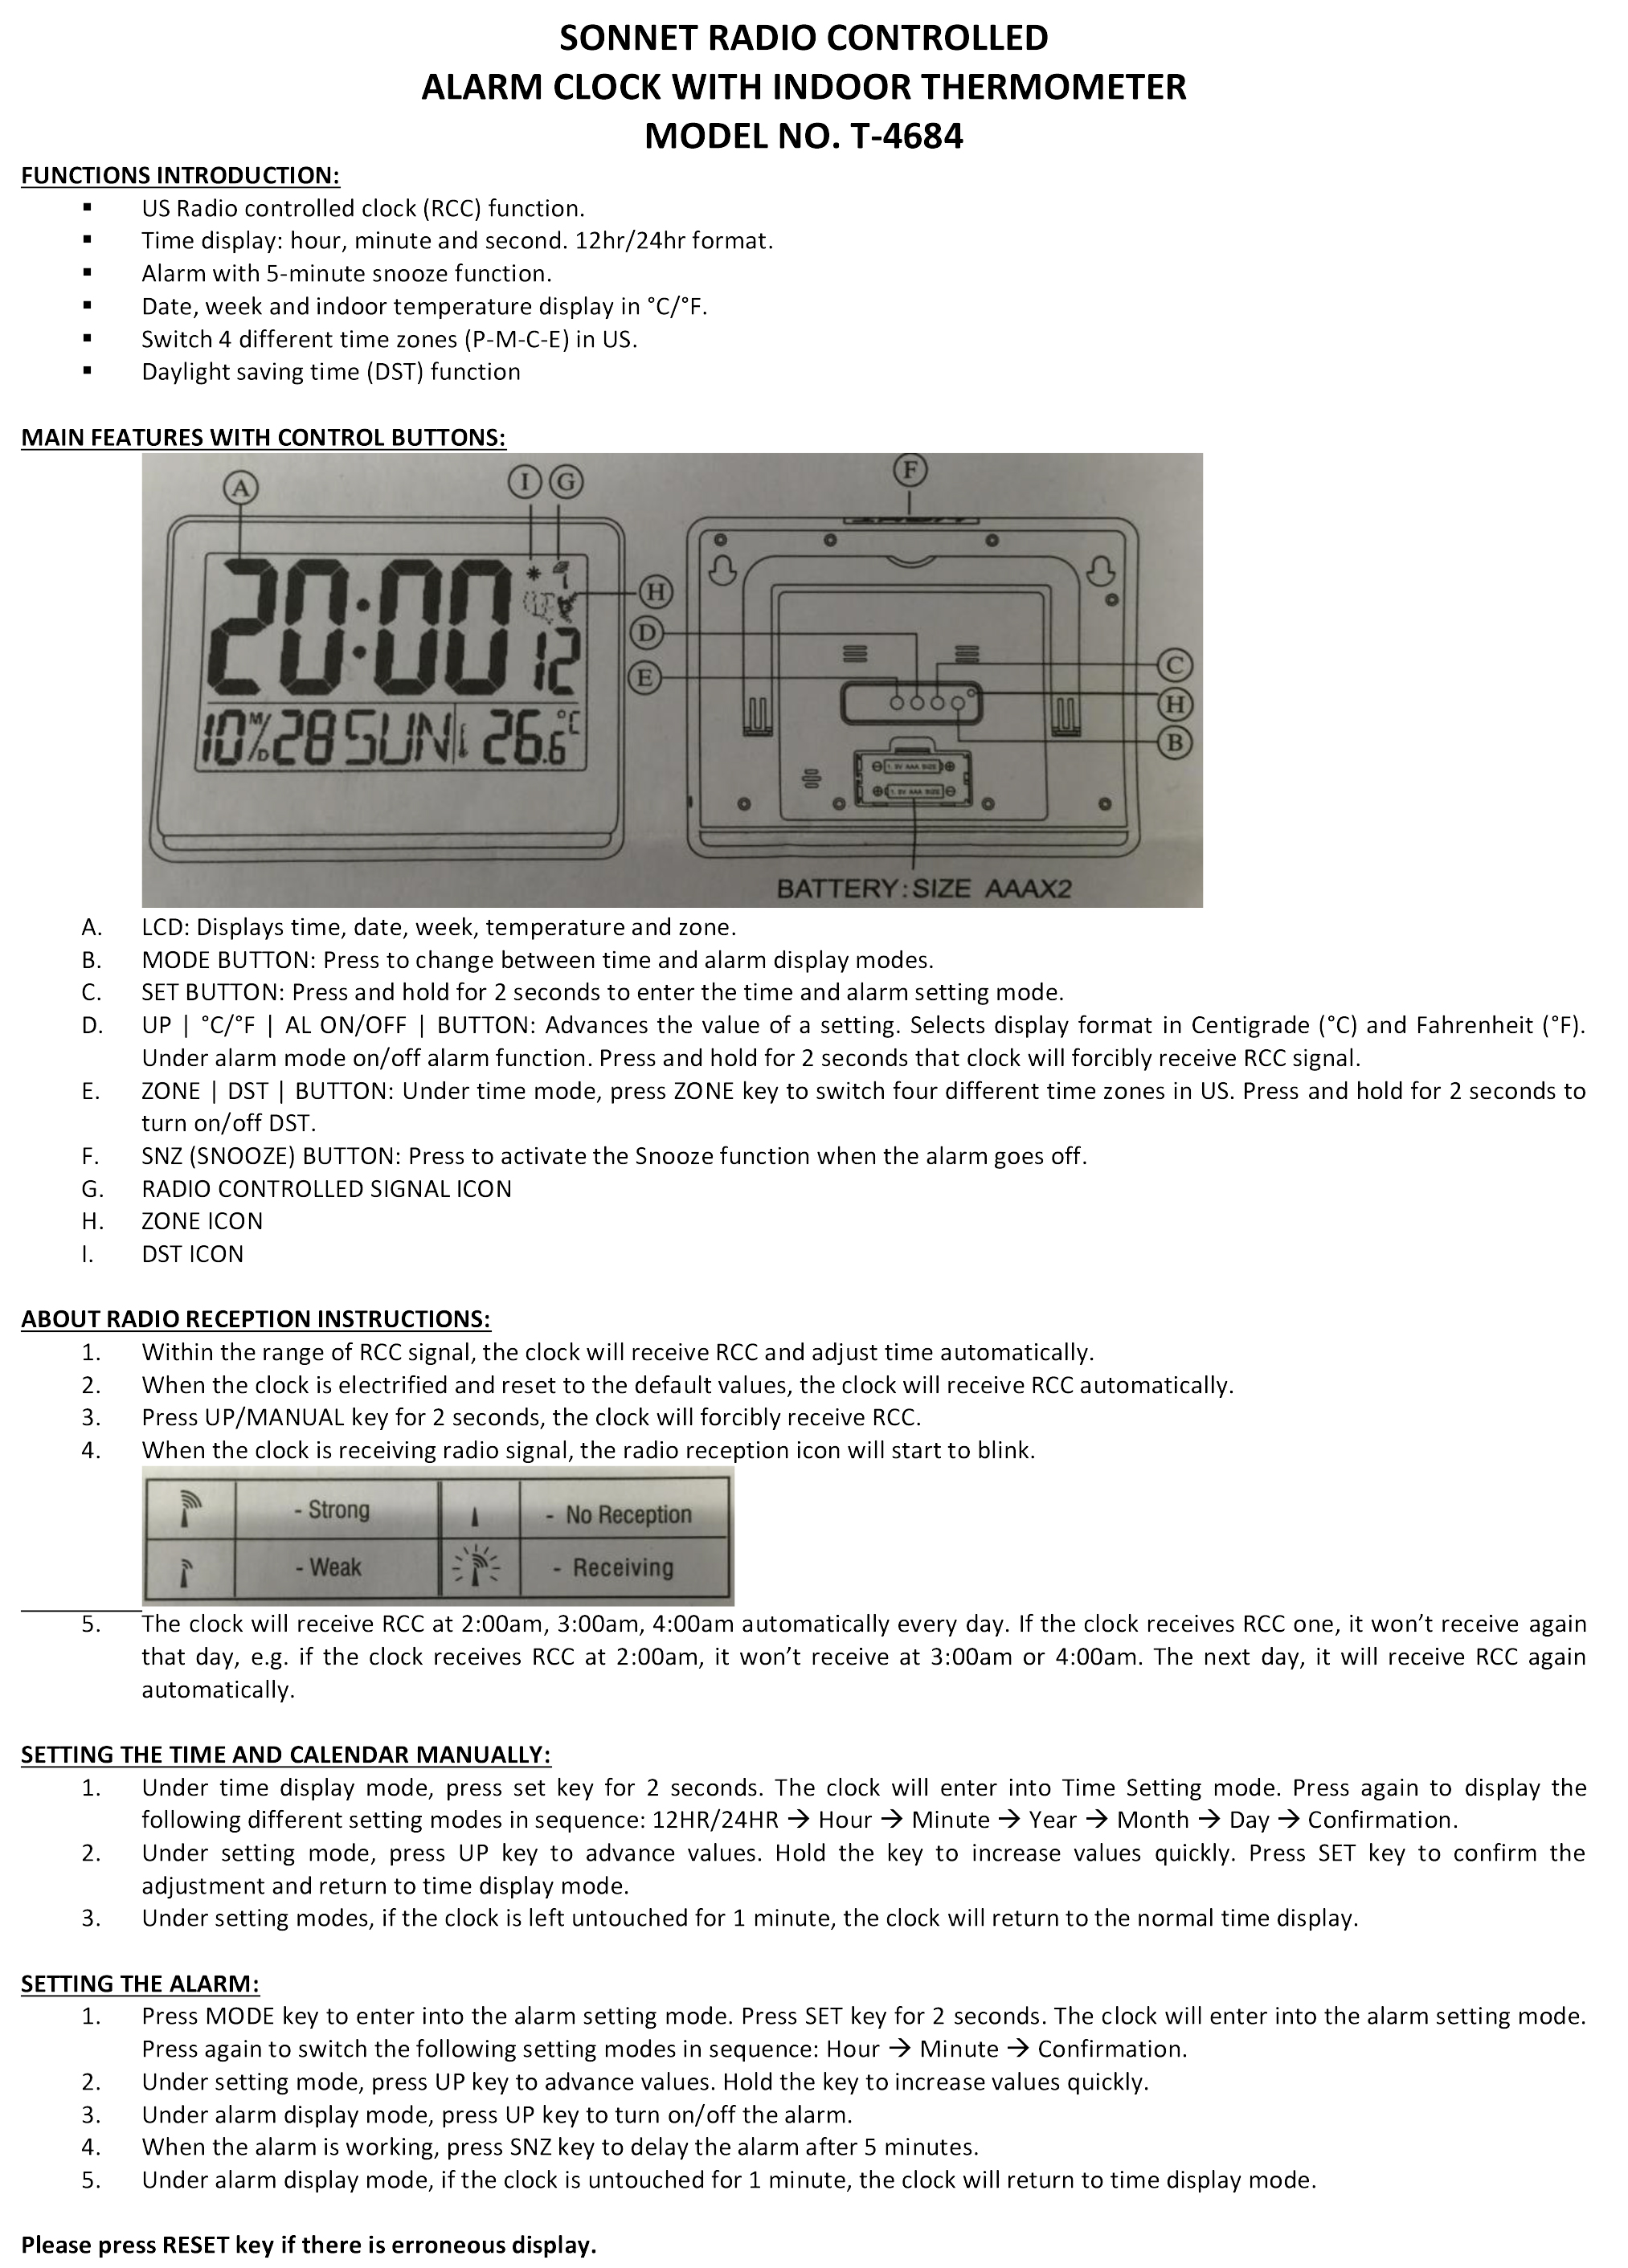 ... manual Array - instructions rh sonnetchicago com